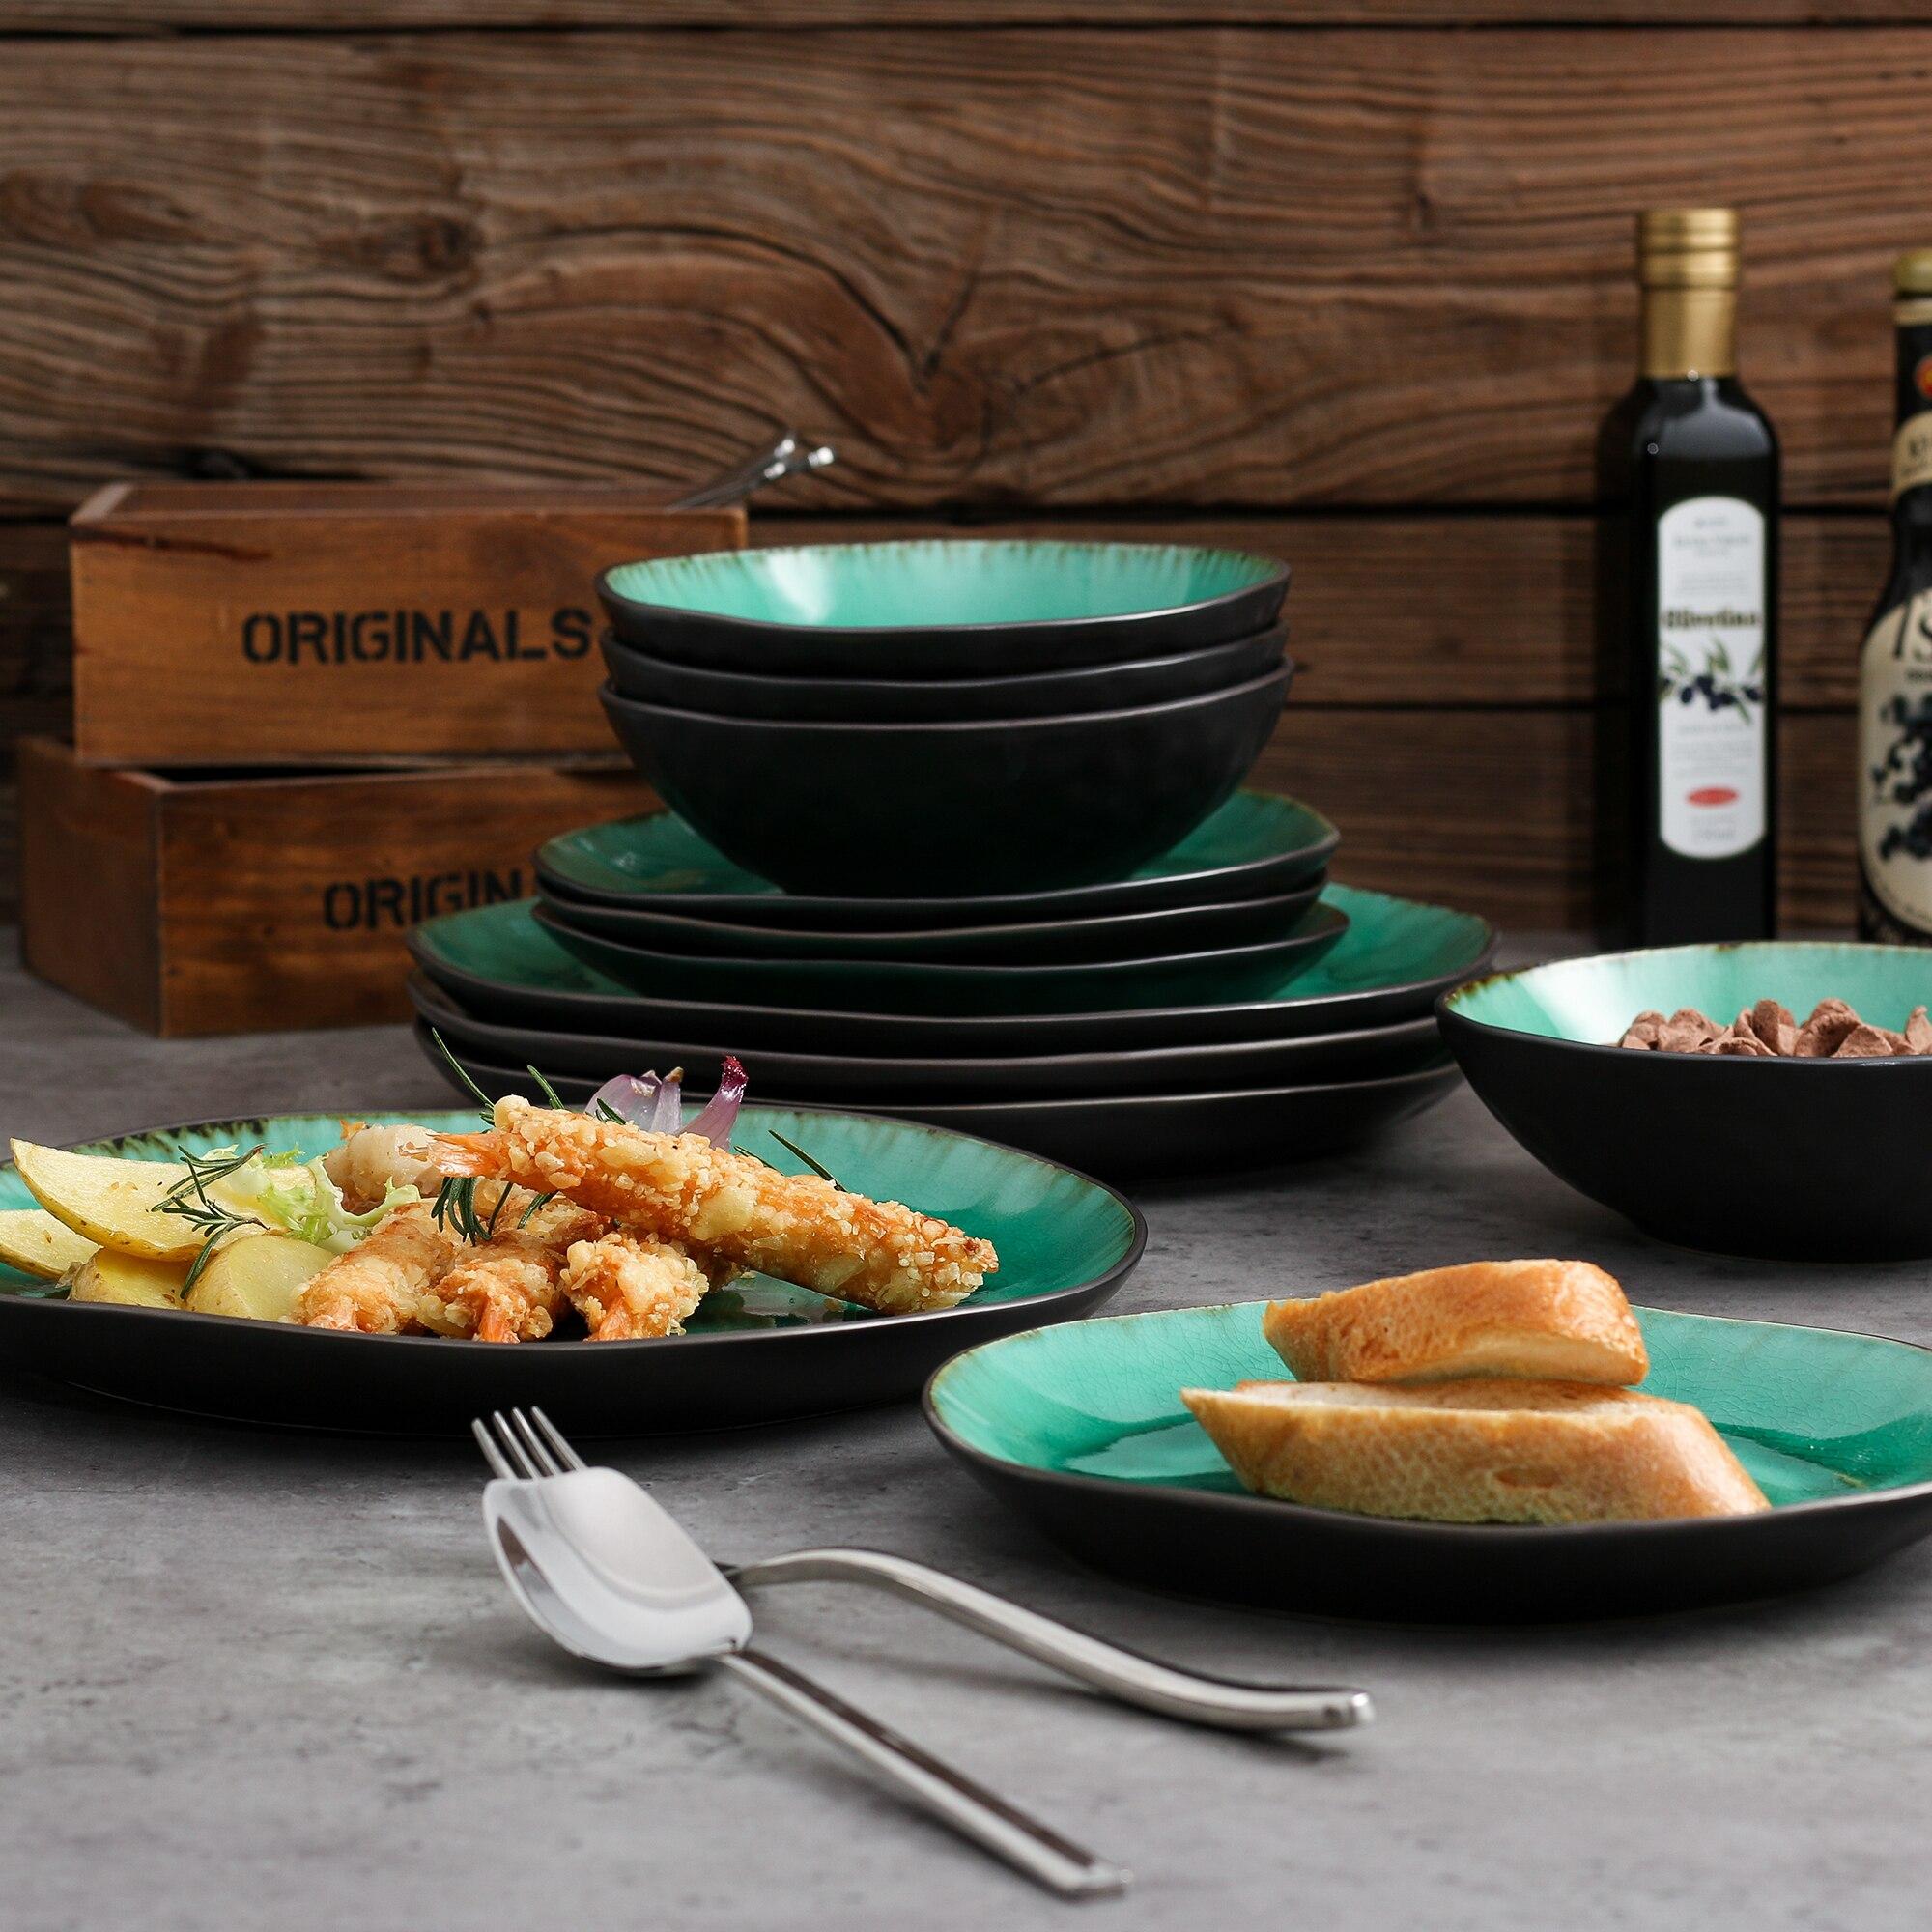 VANCASSO Coco 36-Piece Pottery Stoneware Vintage Look Ceramic Green Dinnerware Set with 12*Dinner Plate,Dessert Plate,Bowl Set